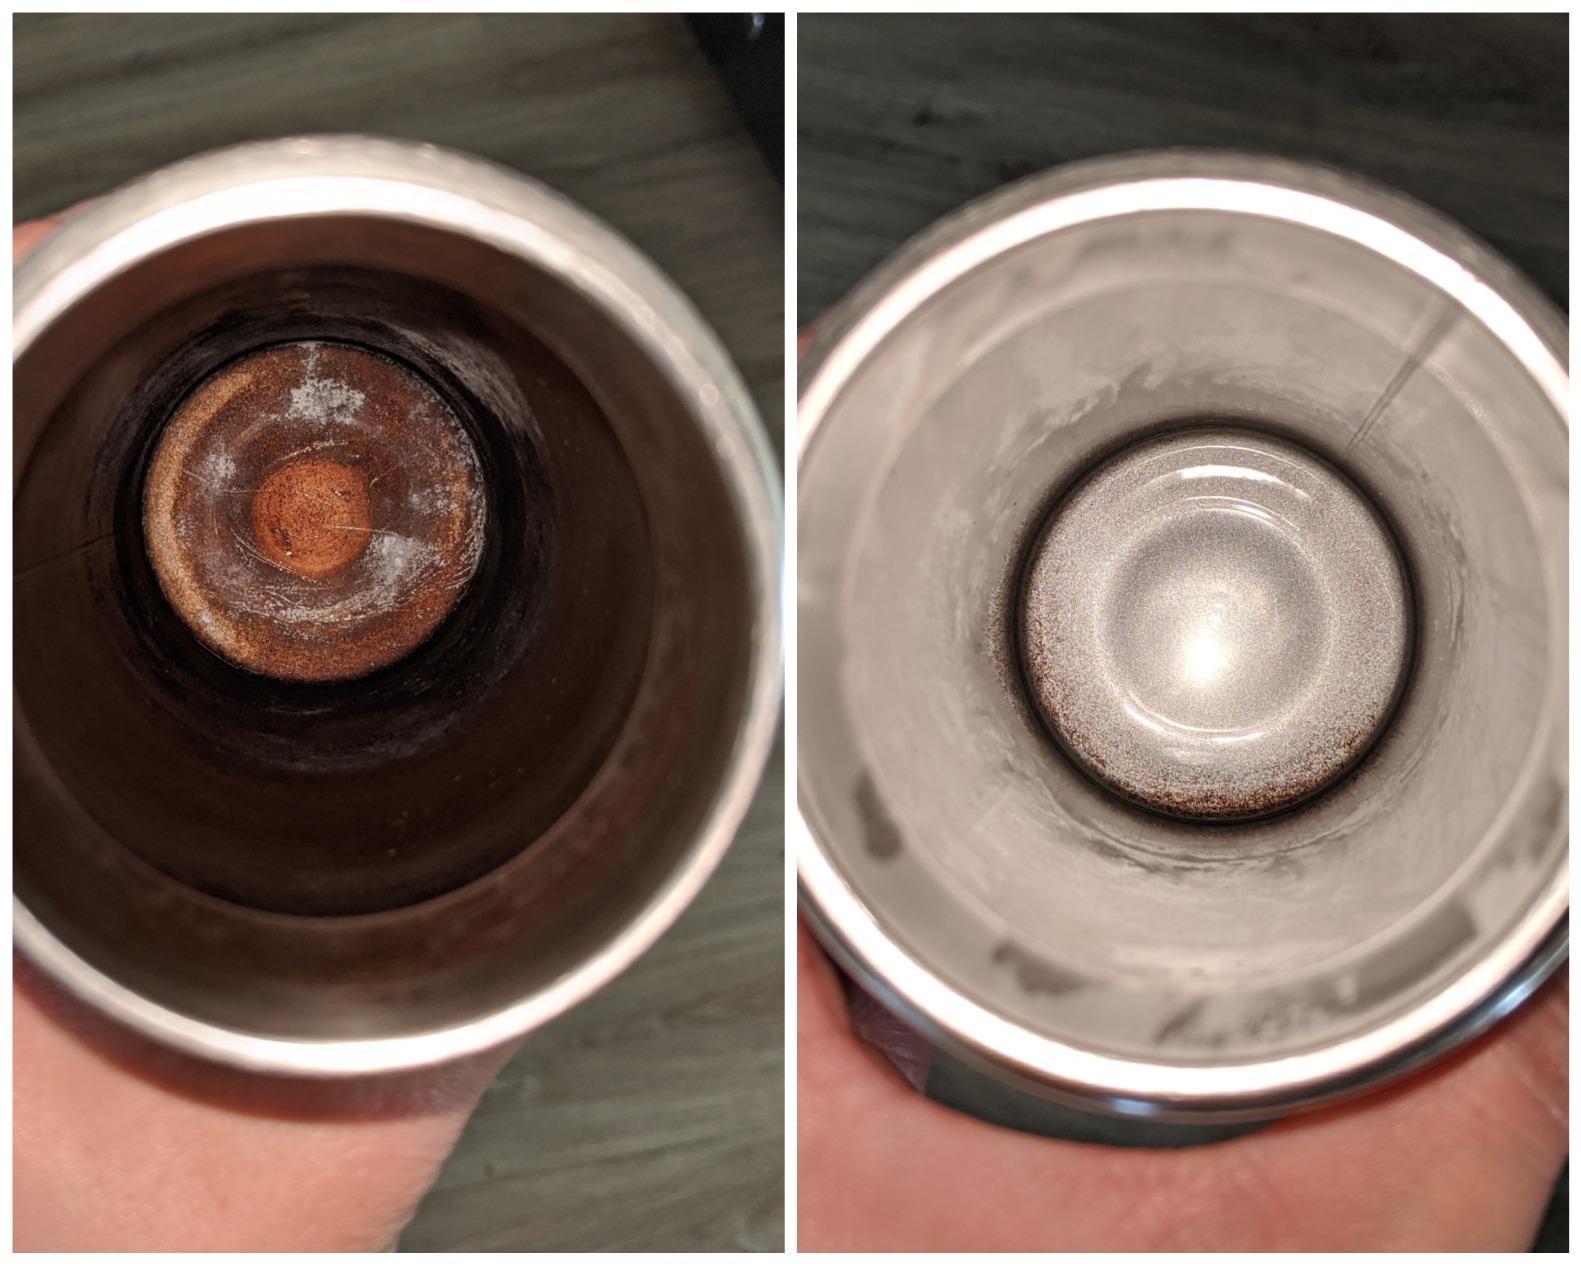 Before: a coffee-stained metal mug; after: the same mug, cleaned